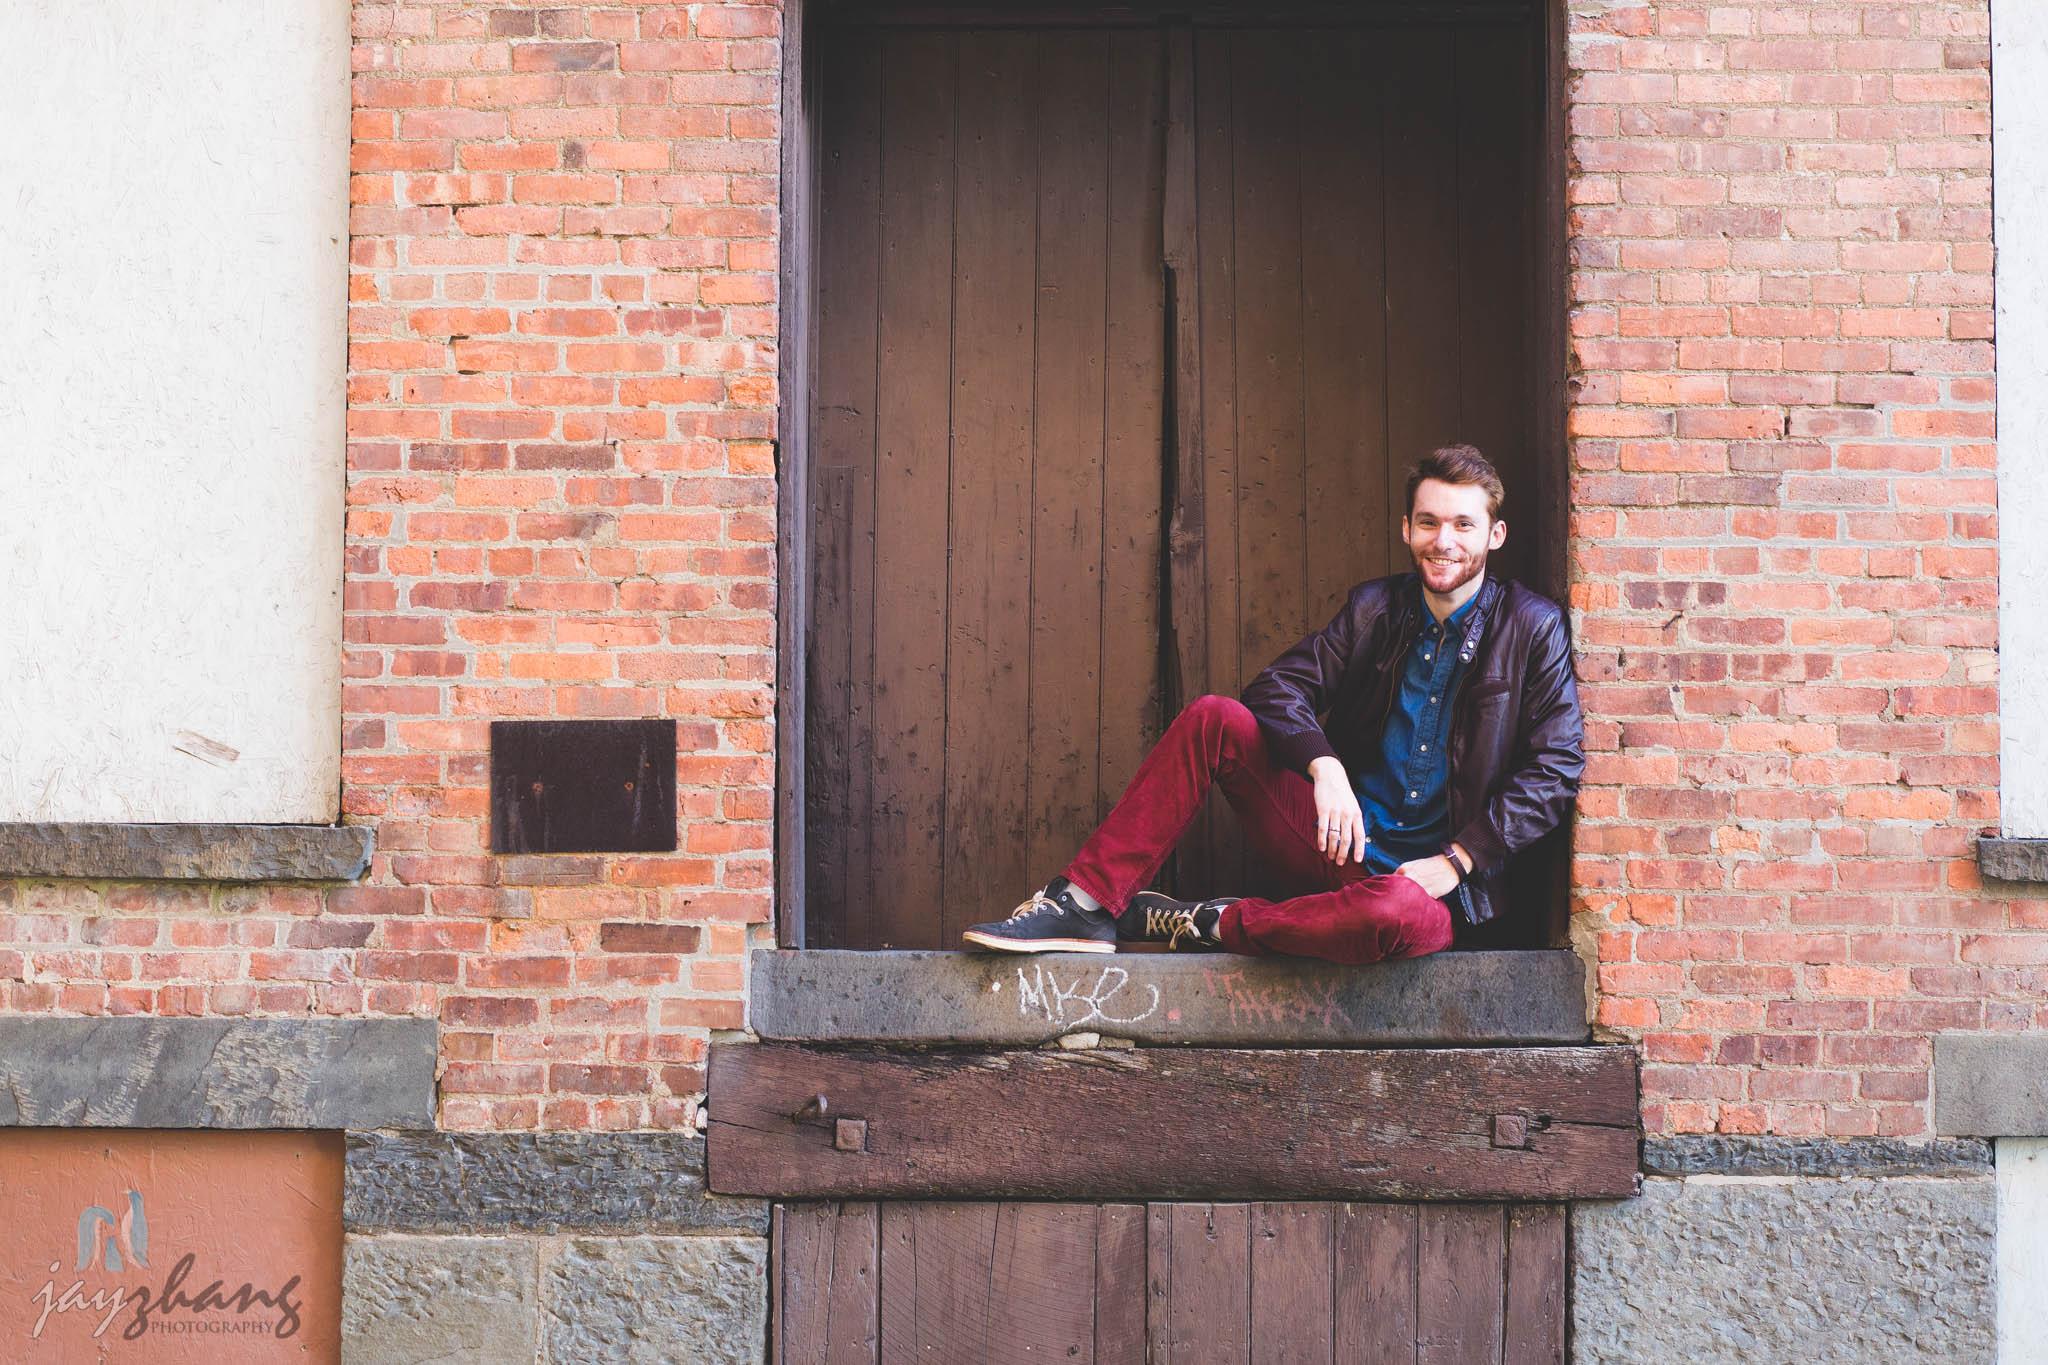 Albany_Portrait_Photographer-5.jpg